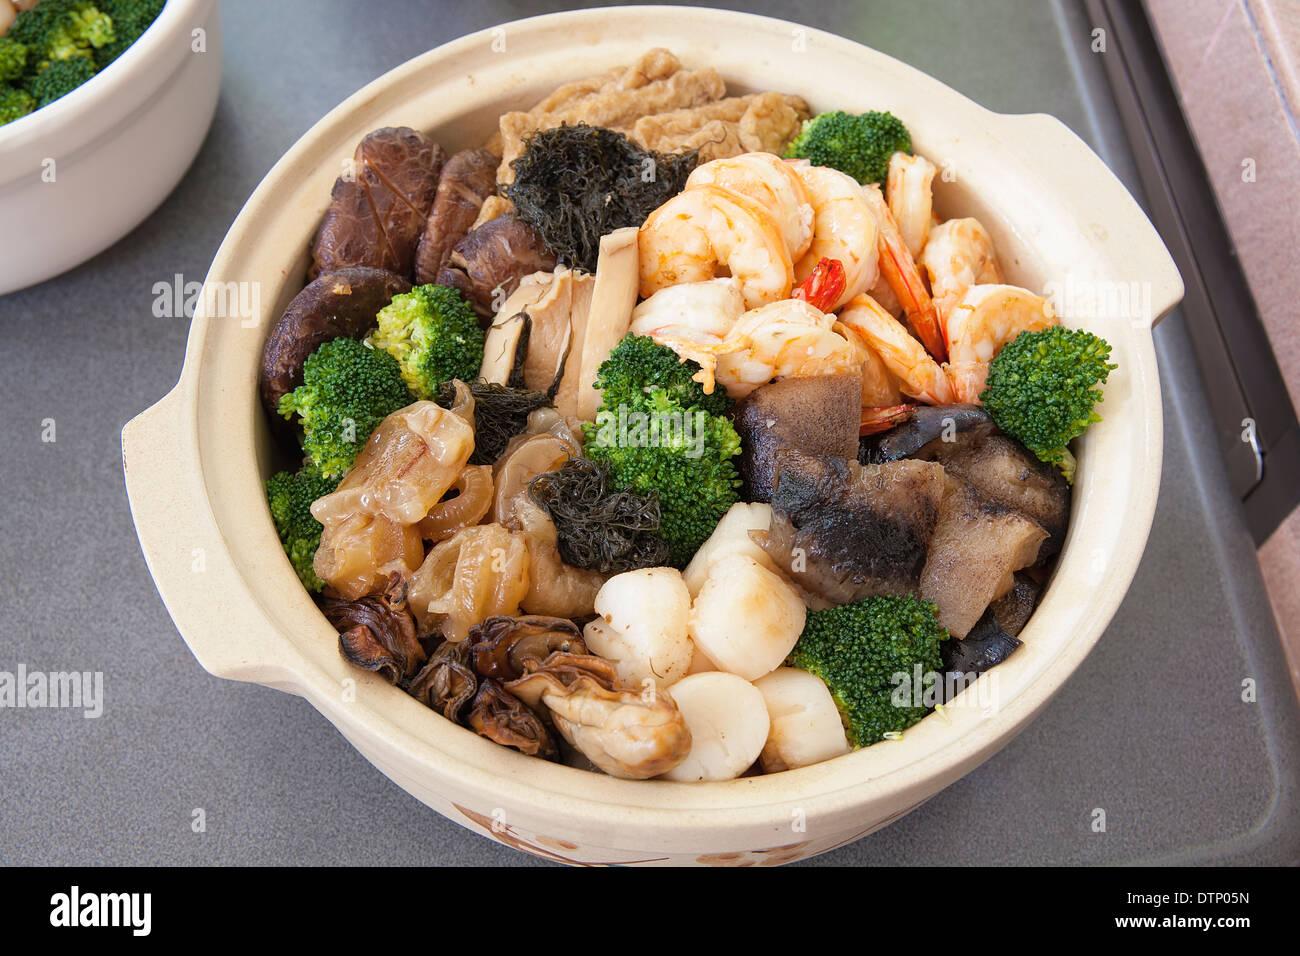 Kantonesische Küche | Poon Choi Hong Kong Kantonesische Kuche Grosses Fest Schale Fur